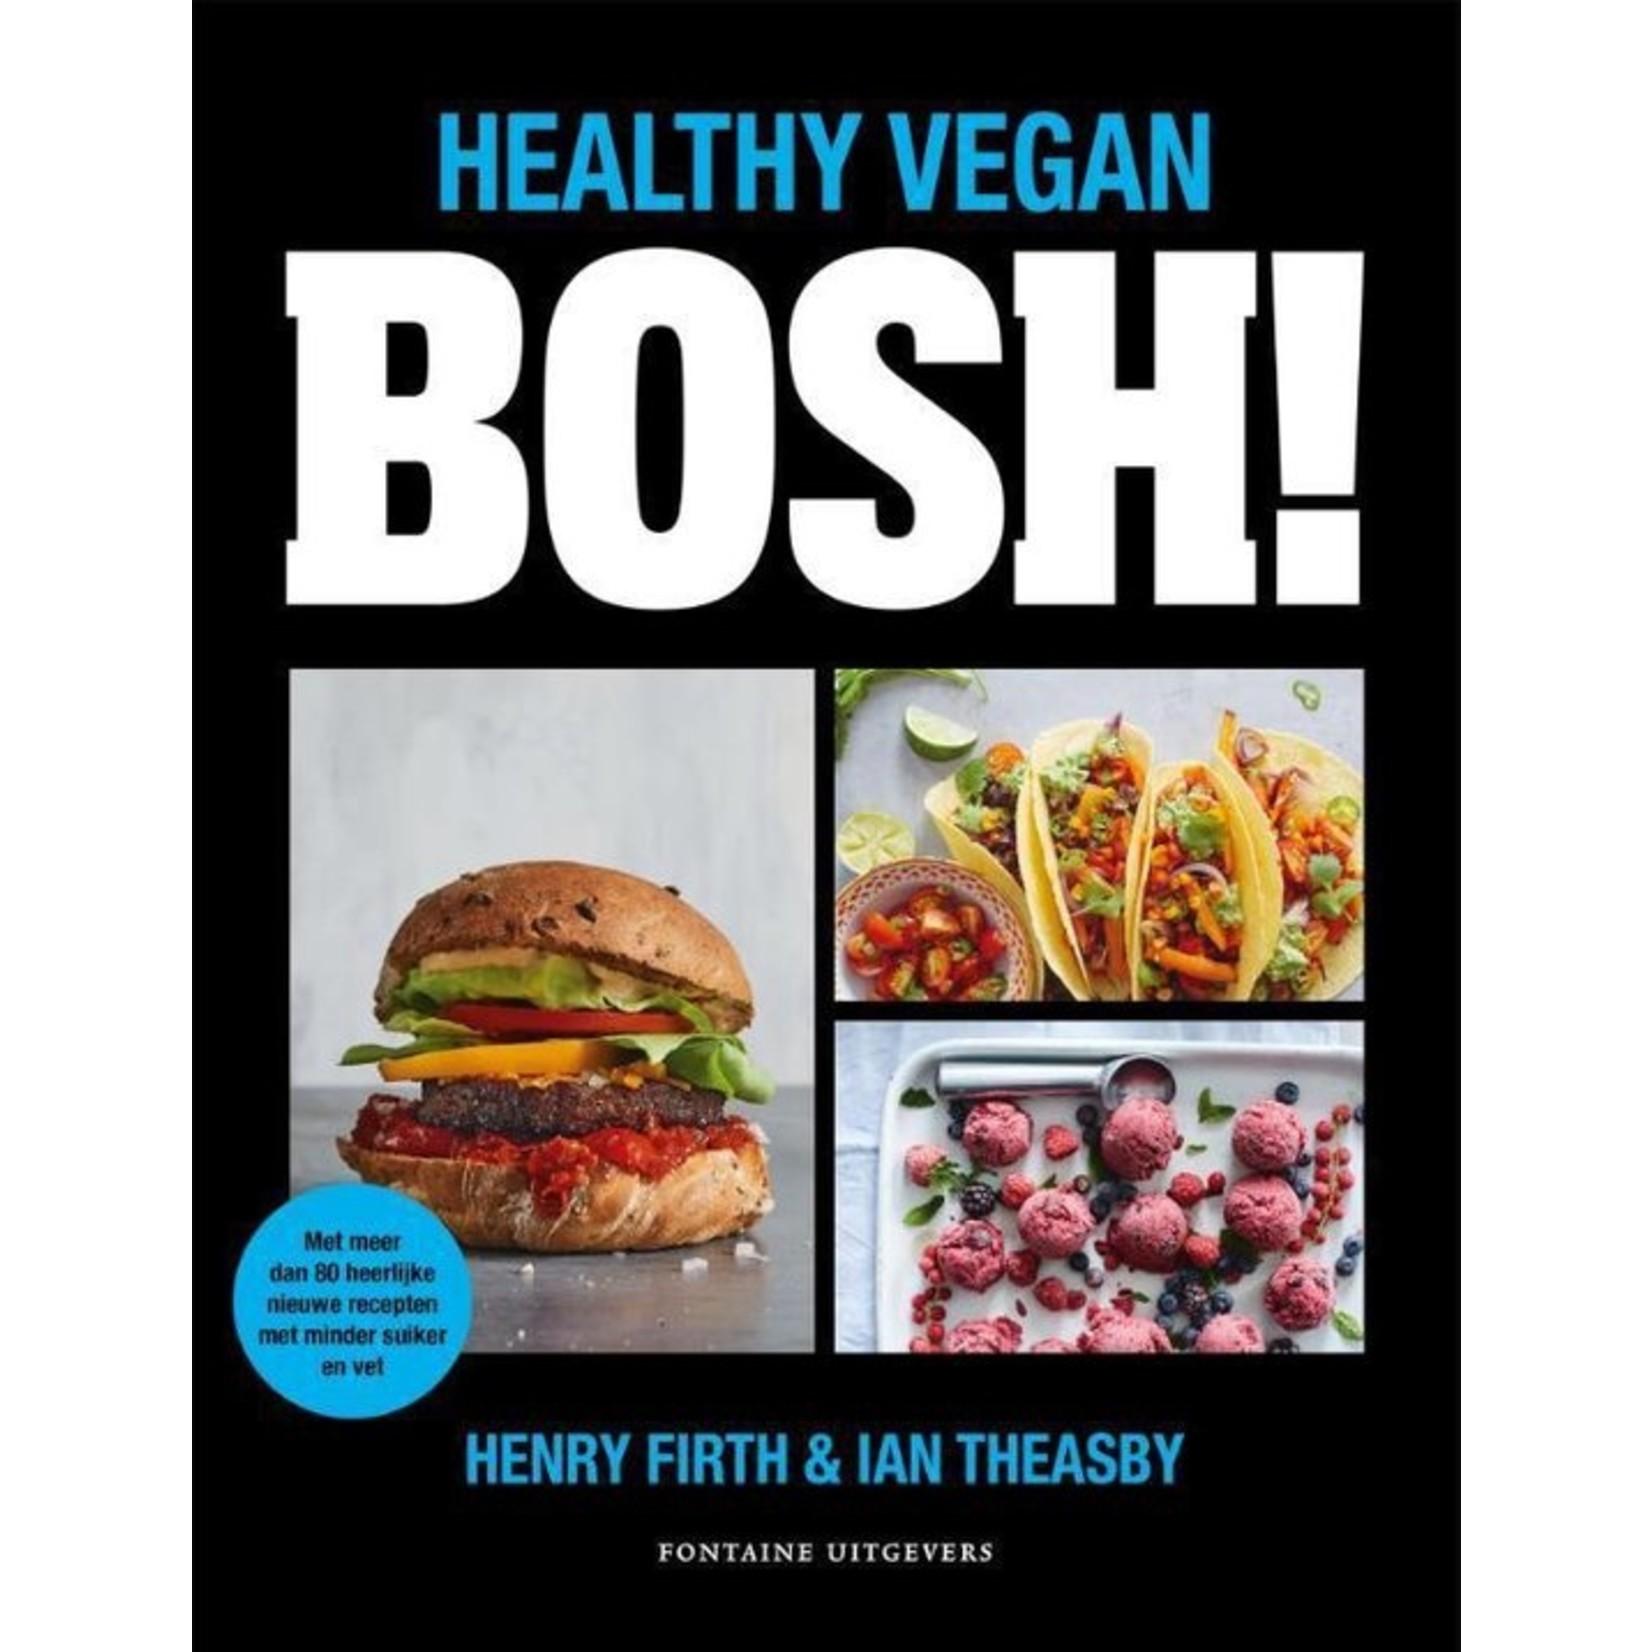 Bosh - healthy vegan